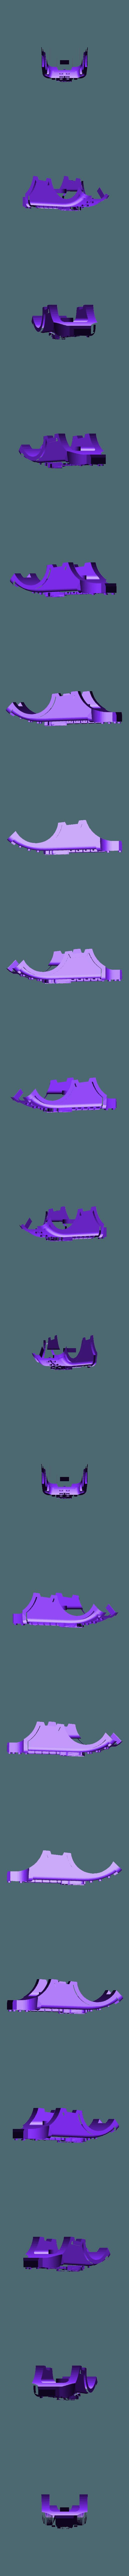 Aztec_Armiger_legarmor_V2.stl Download free STL file Aztec Armor Bearer  - Conversion Kit • Model to 3D print, ErikTheHeretek